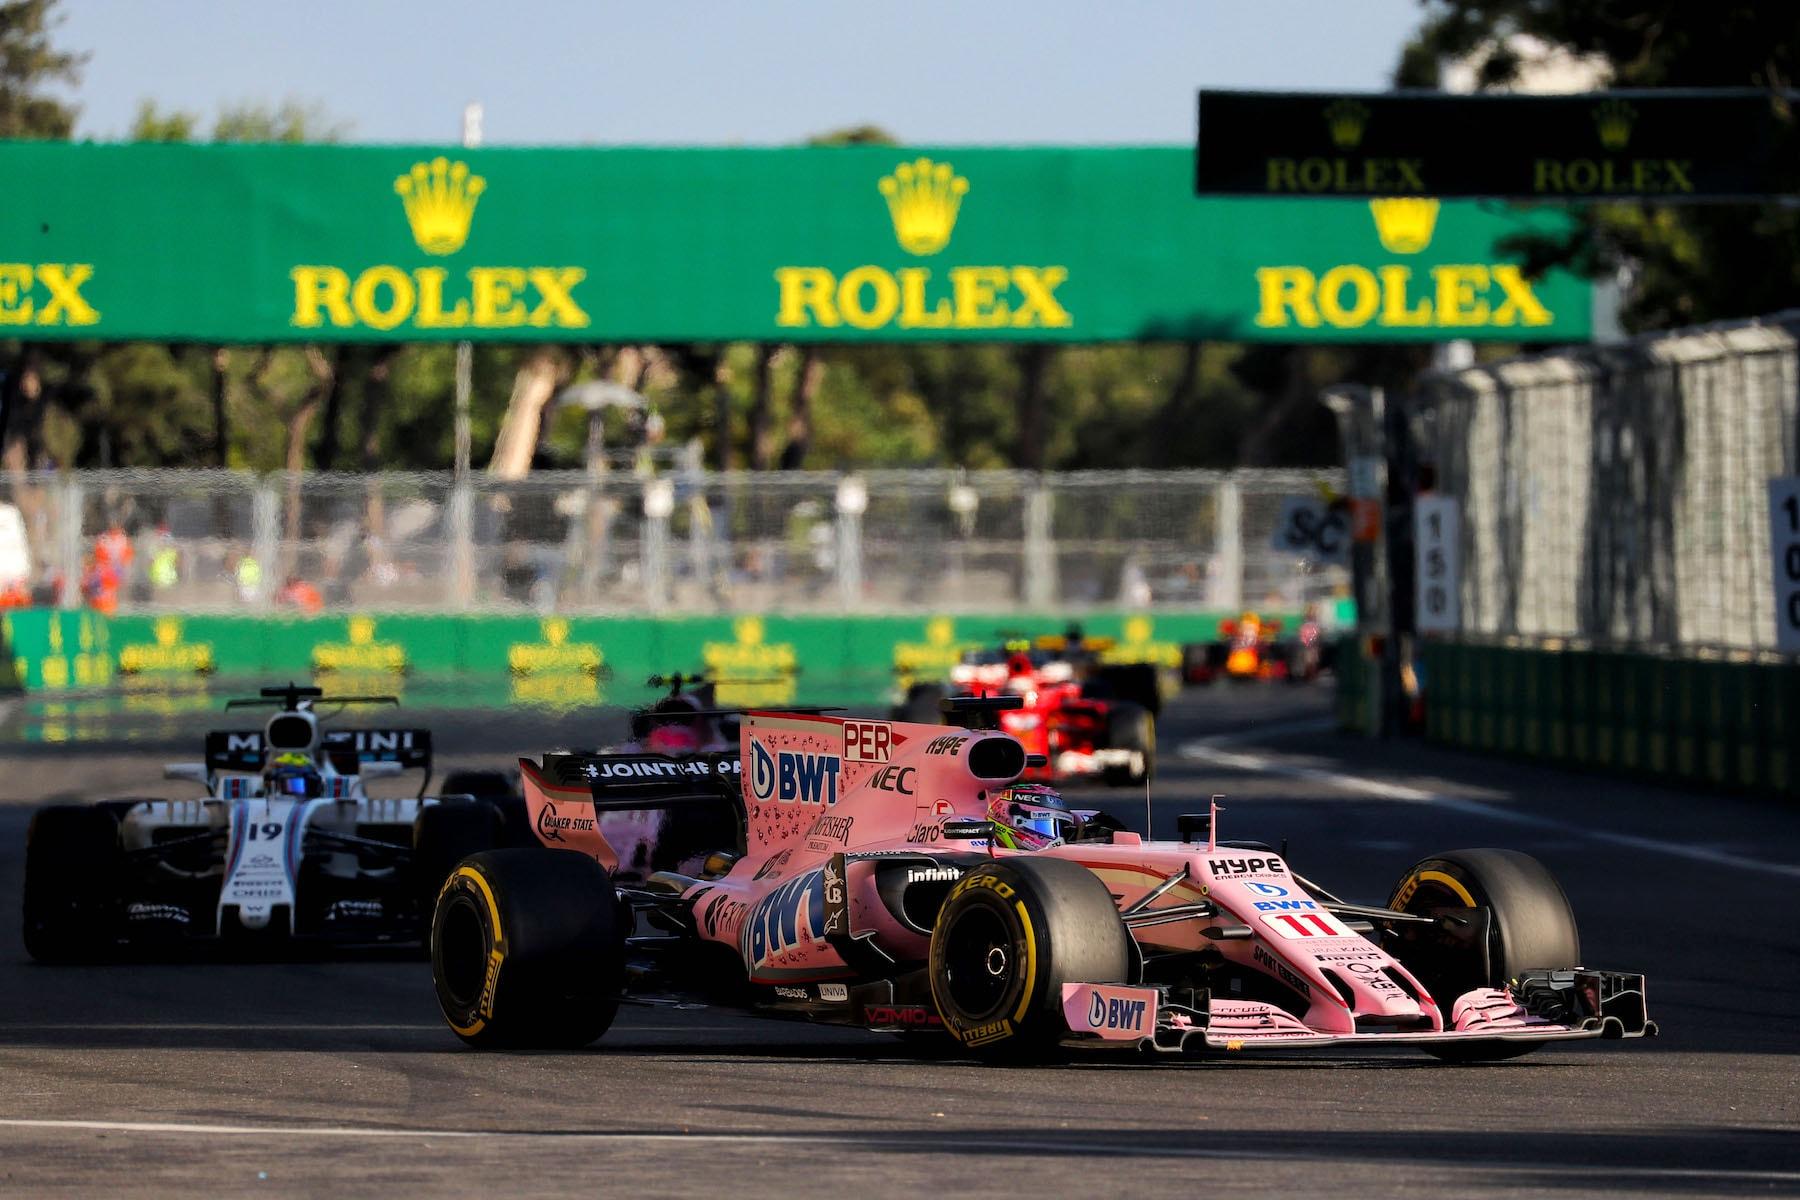 G 2017 Sergio Perez | Force India VJM10 | 2017 Azerbaijan GP DNF 1 copy.jpg